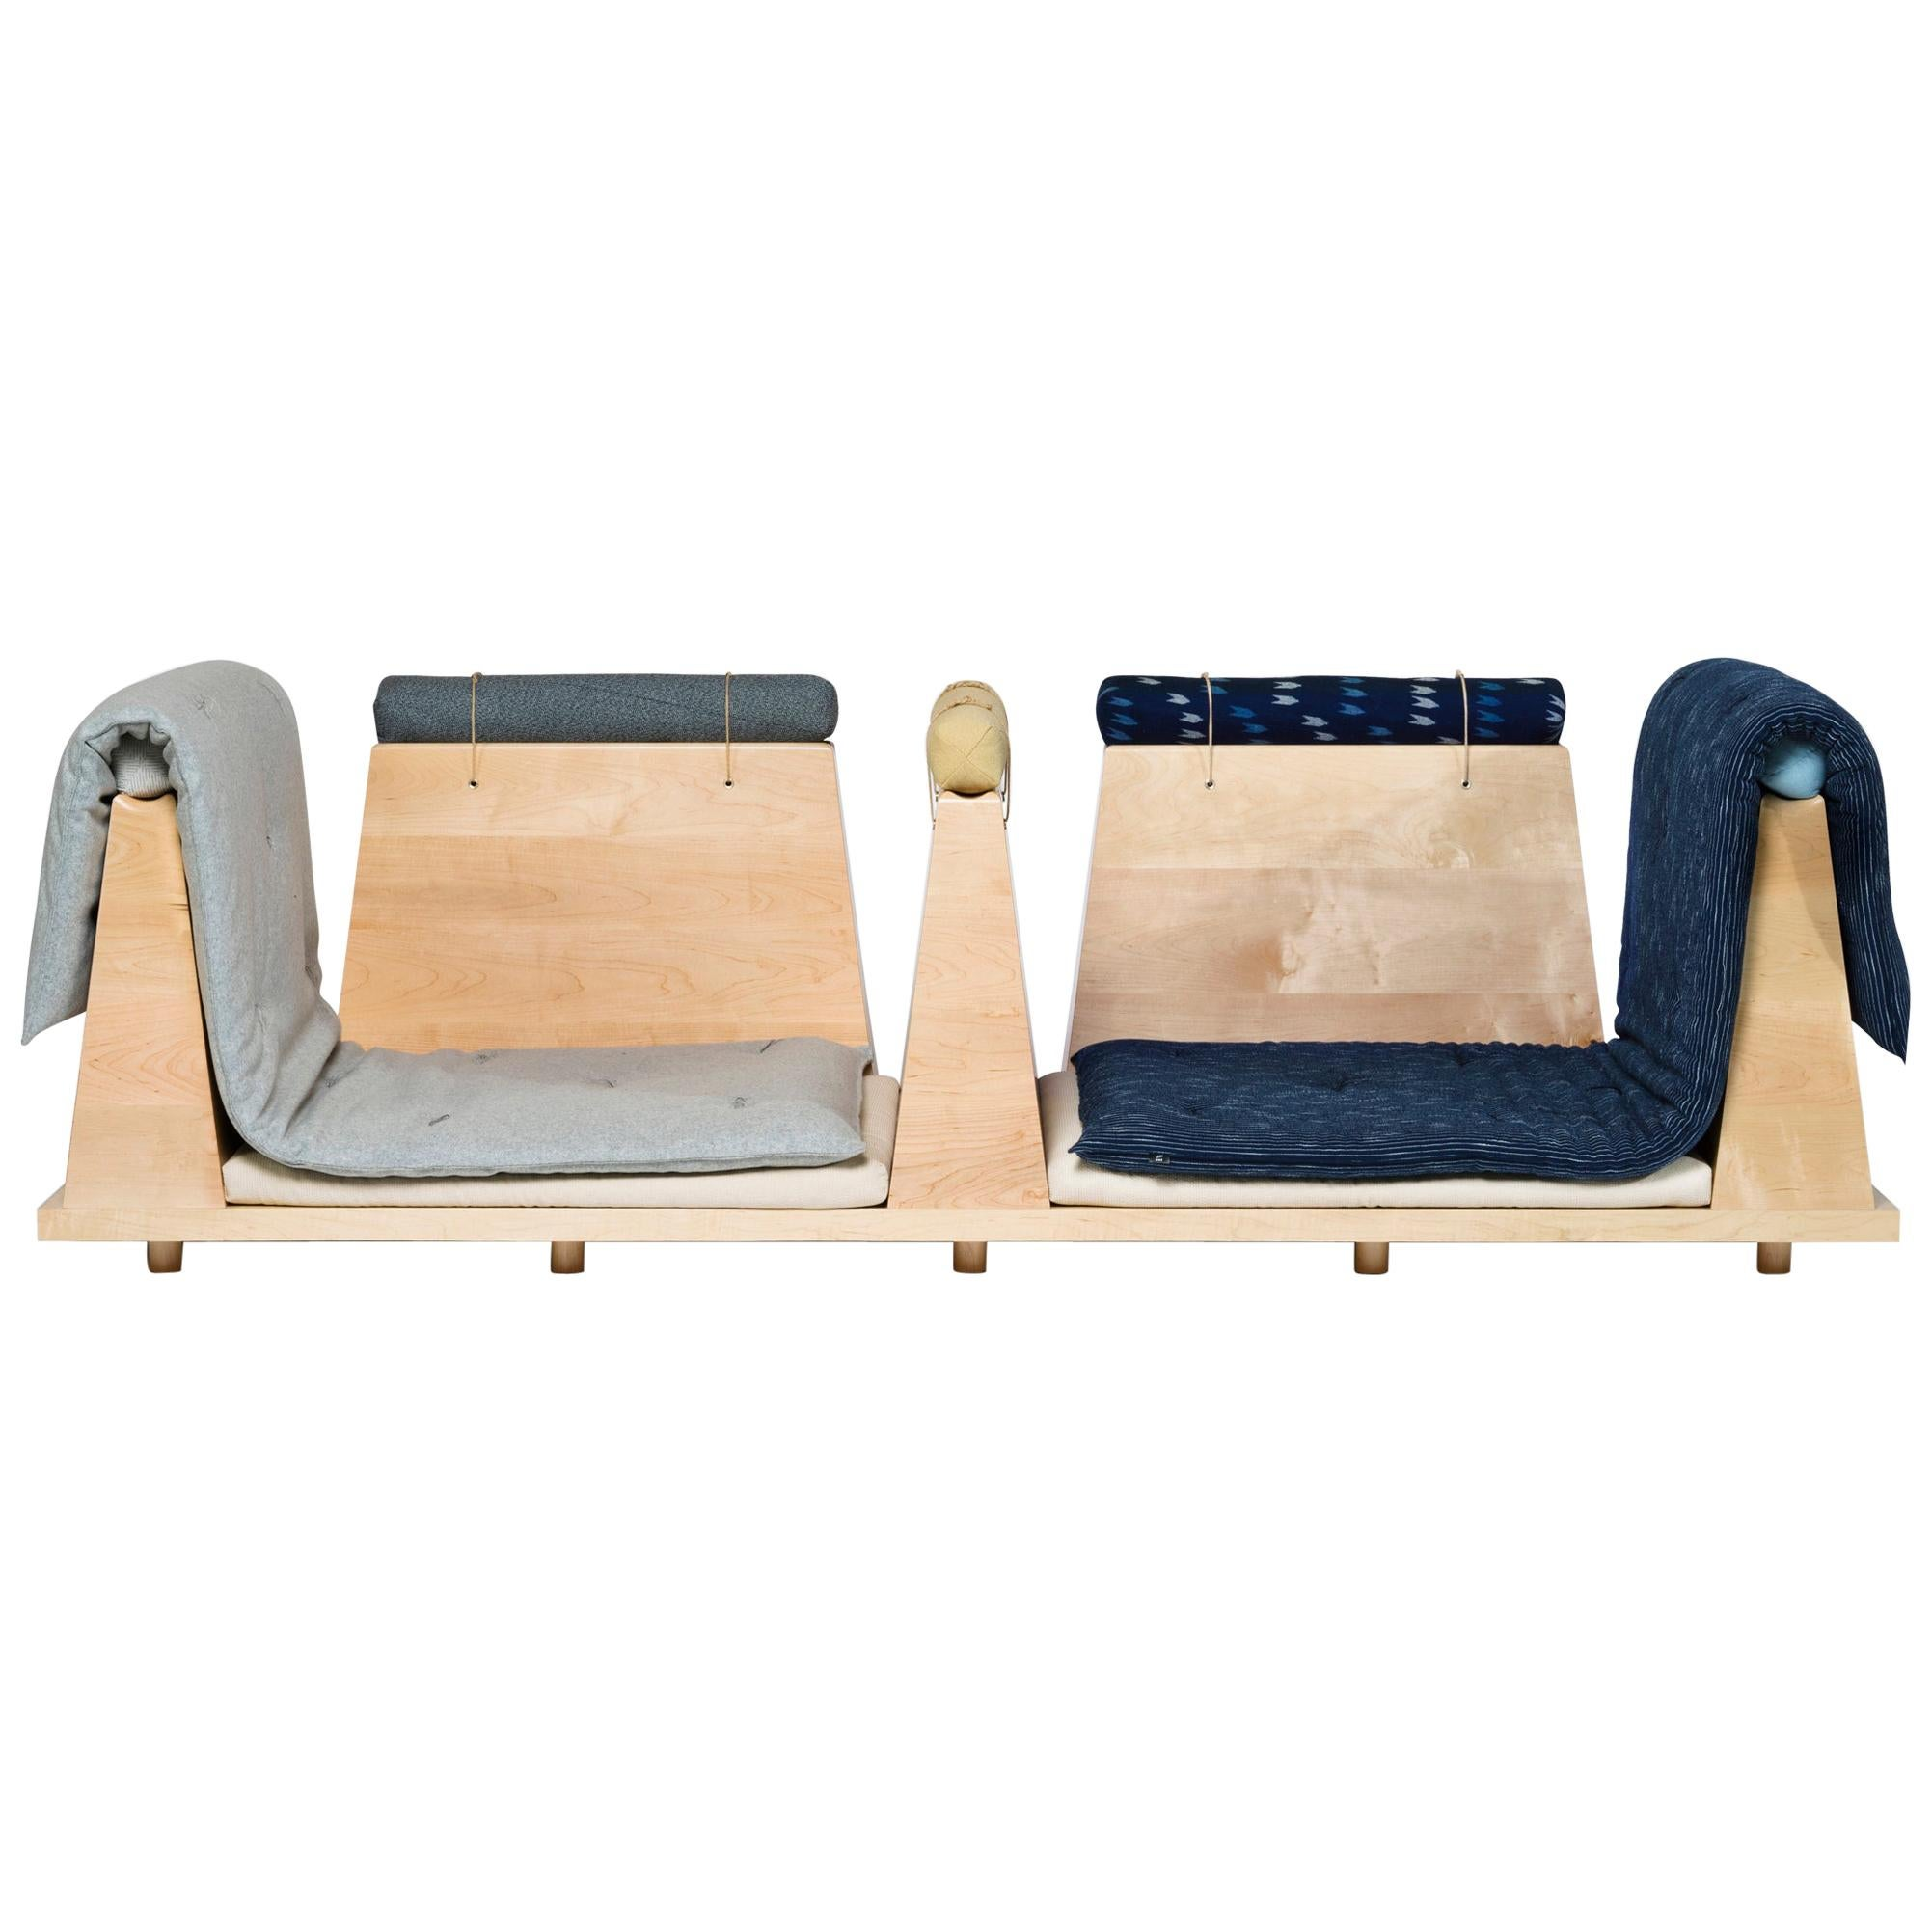 Zabuton Sofa, Handmade Japanese Futon on Modular Maple Frame, Kvadrat, Sou Sou